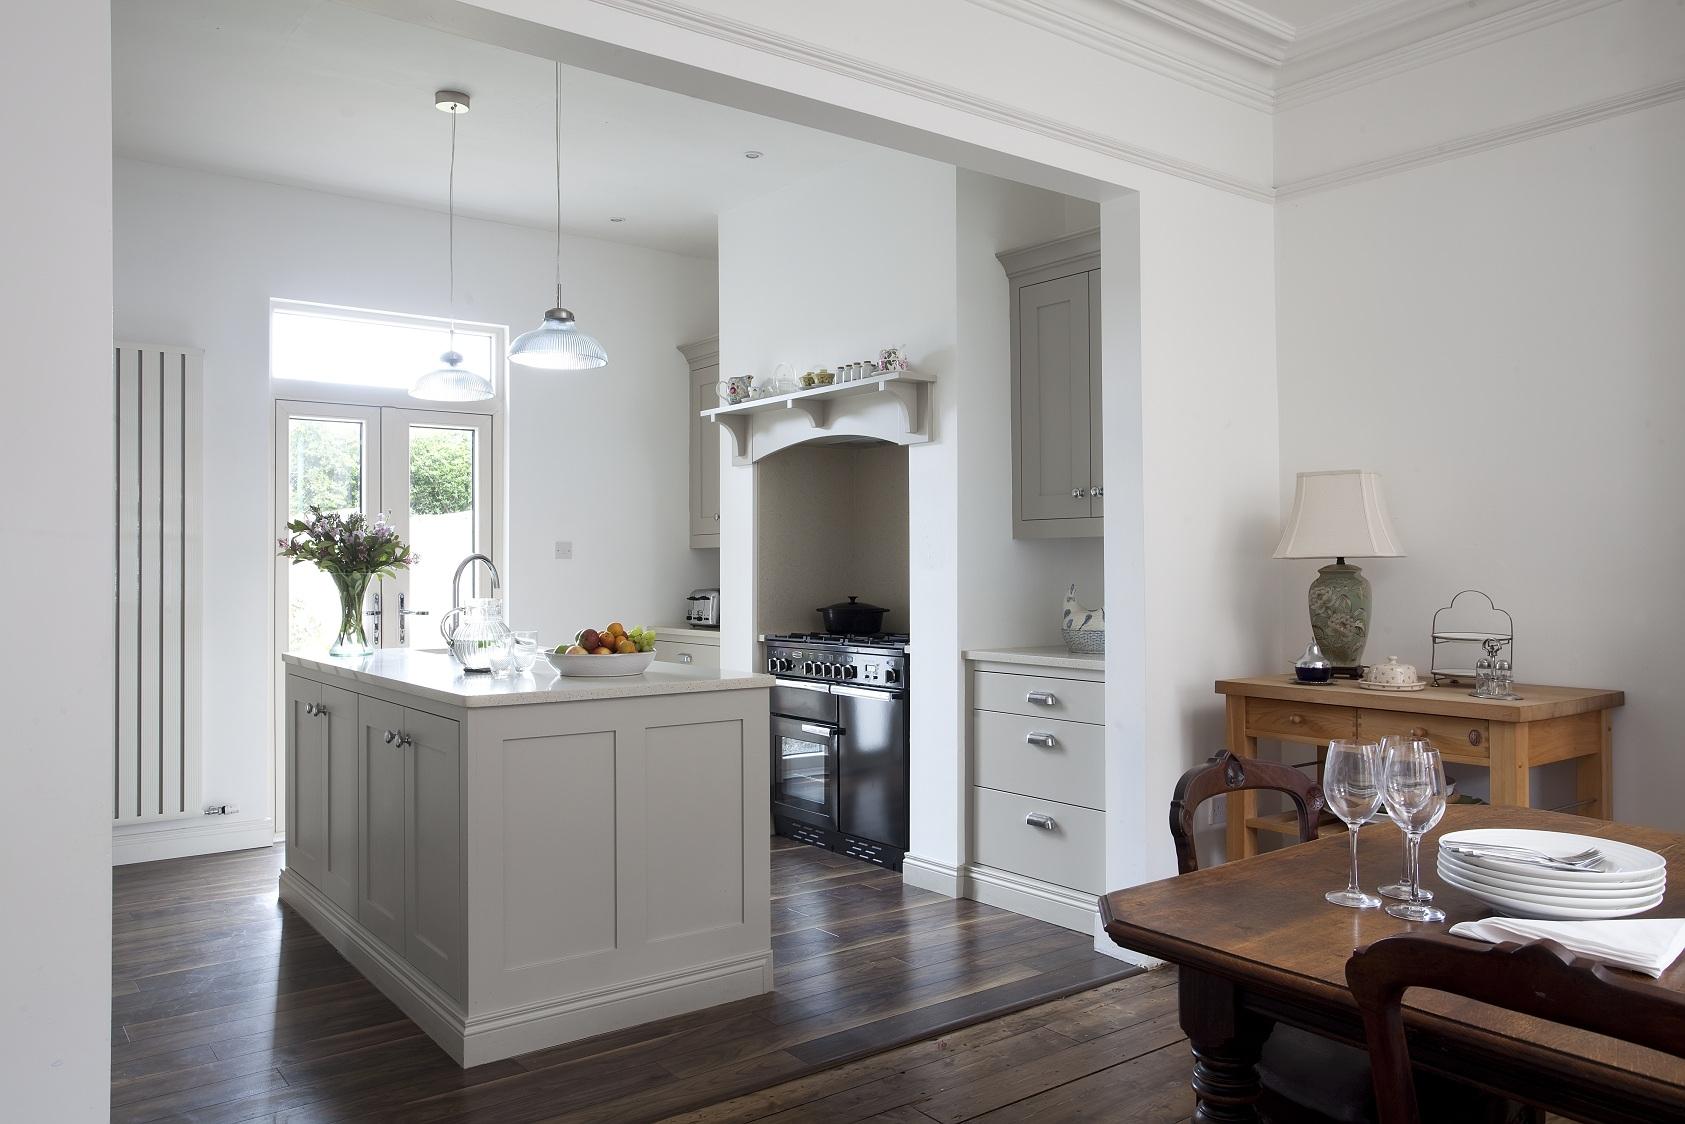 plain english kitchen design ireland noel dempsey design. Black Bedroom Furniture Sets. Home Design Ideas